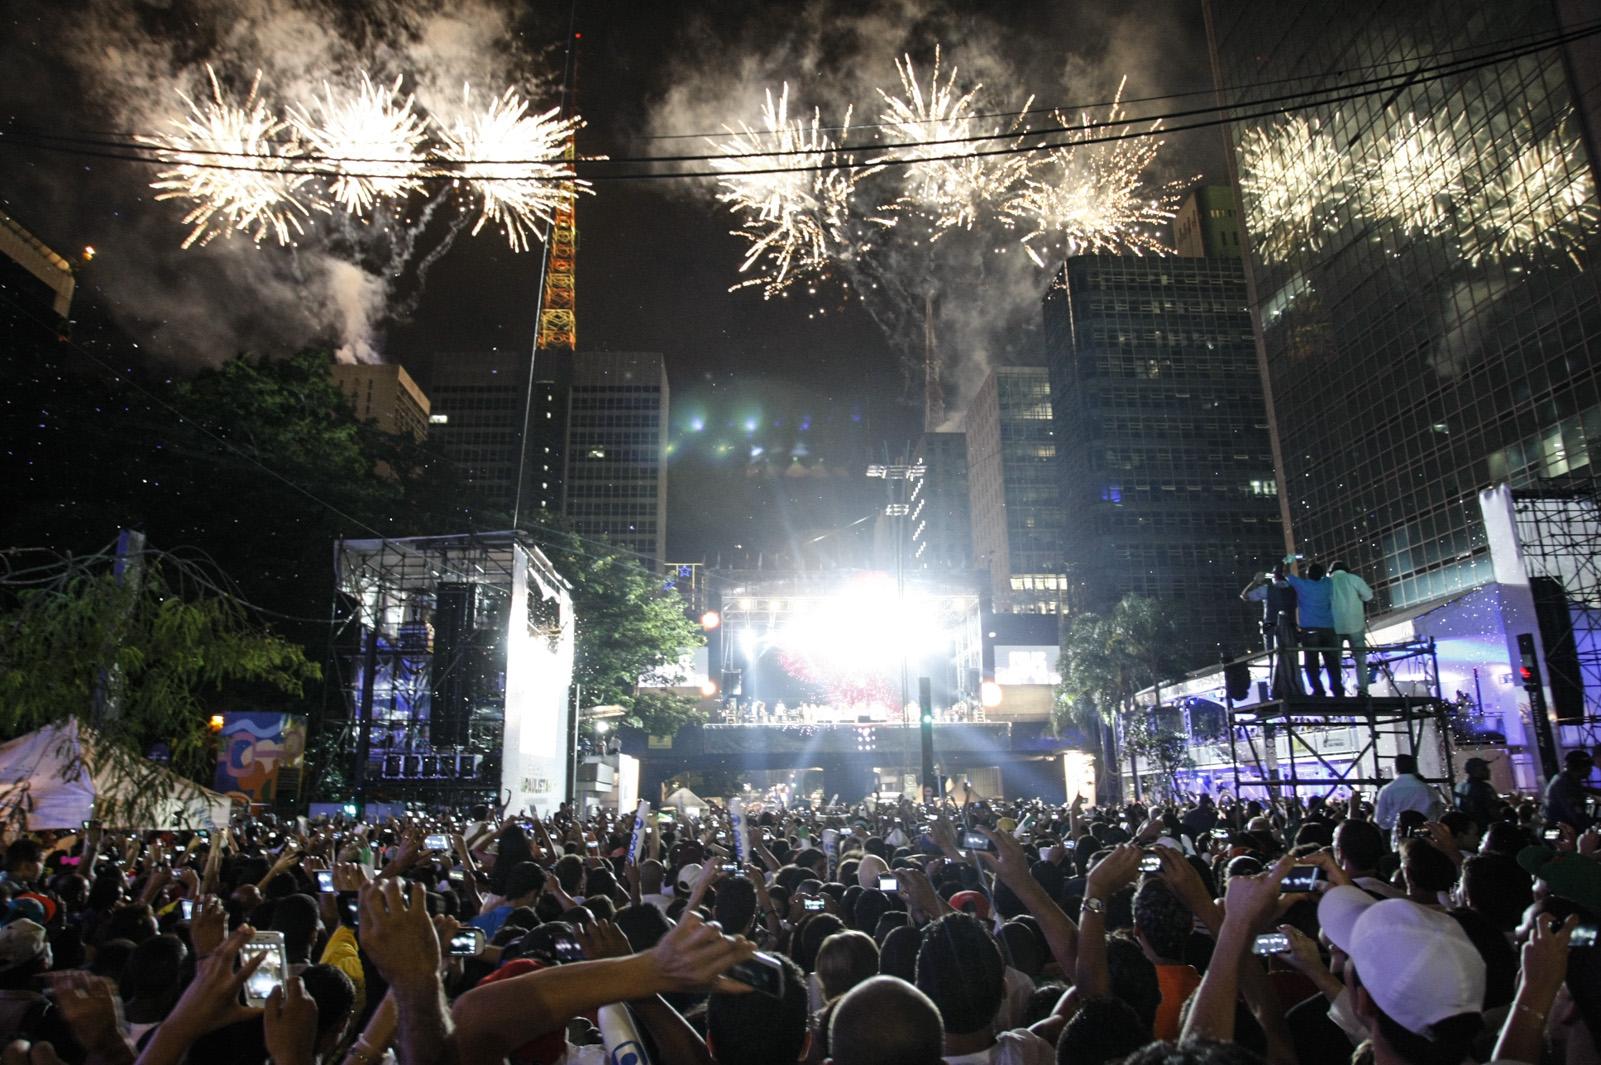 Fogos iluminam céu da Paulista durante a Virada